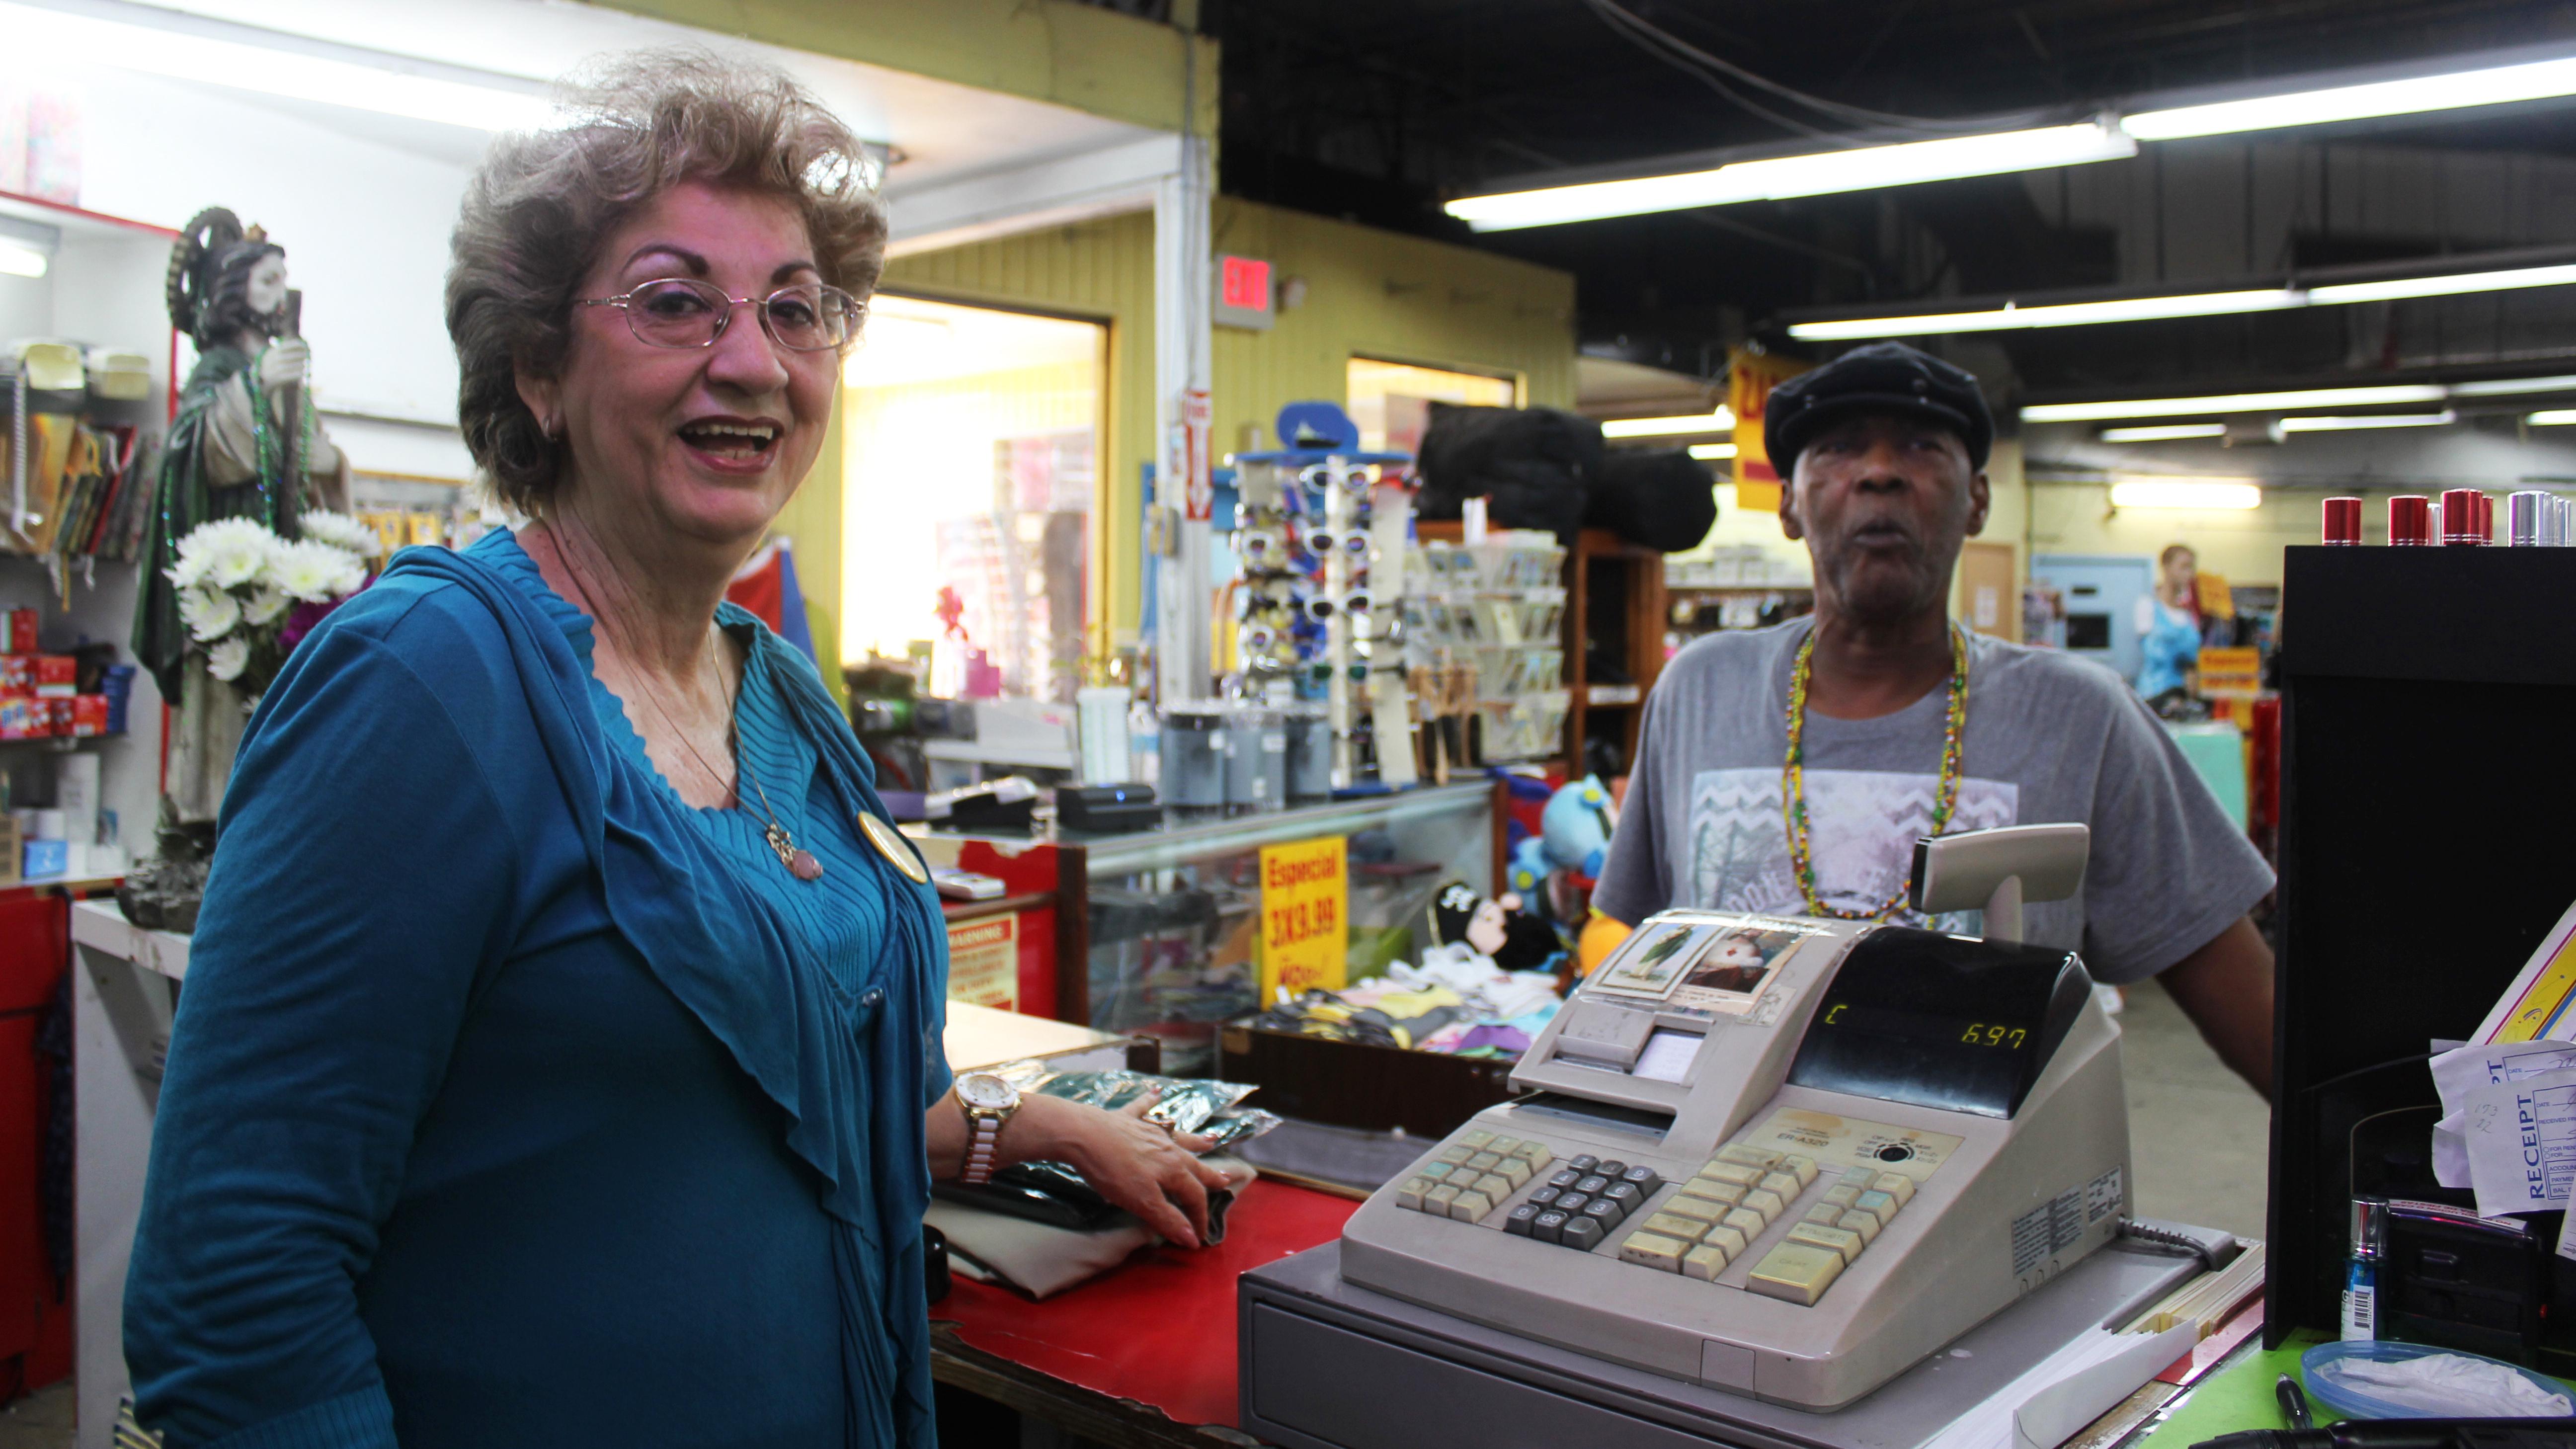 U.S. consumer spending rises, inflation pressures muted | Reuters